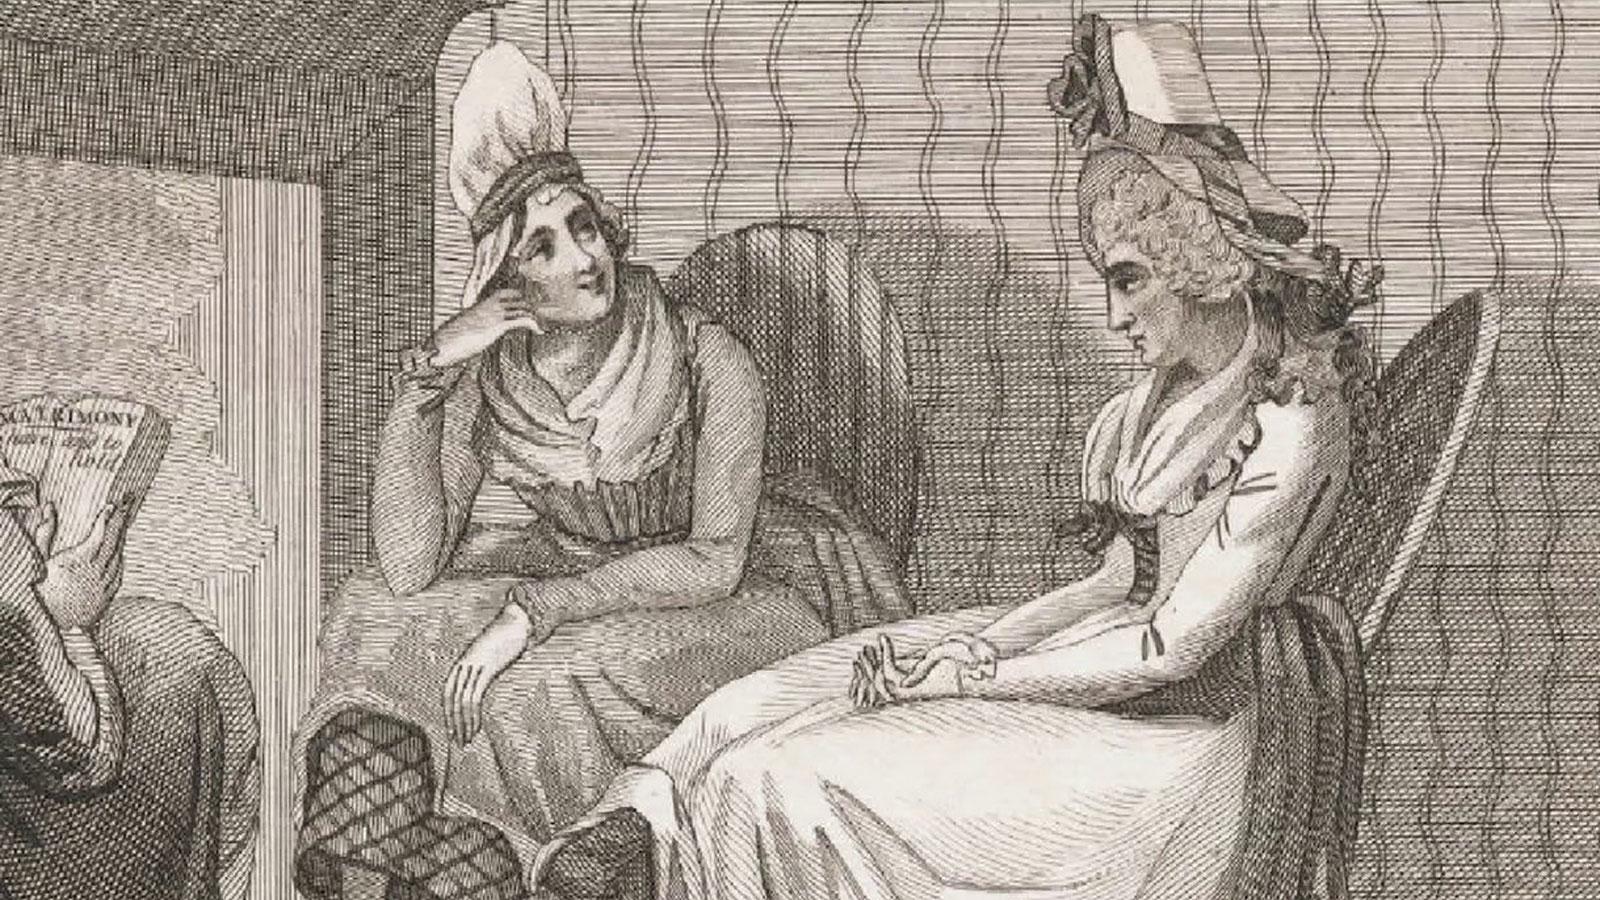 Jane Austen - Gender and morality